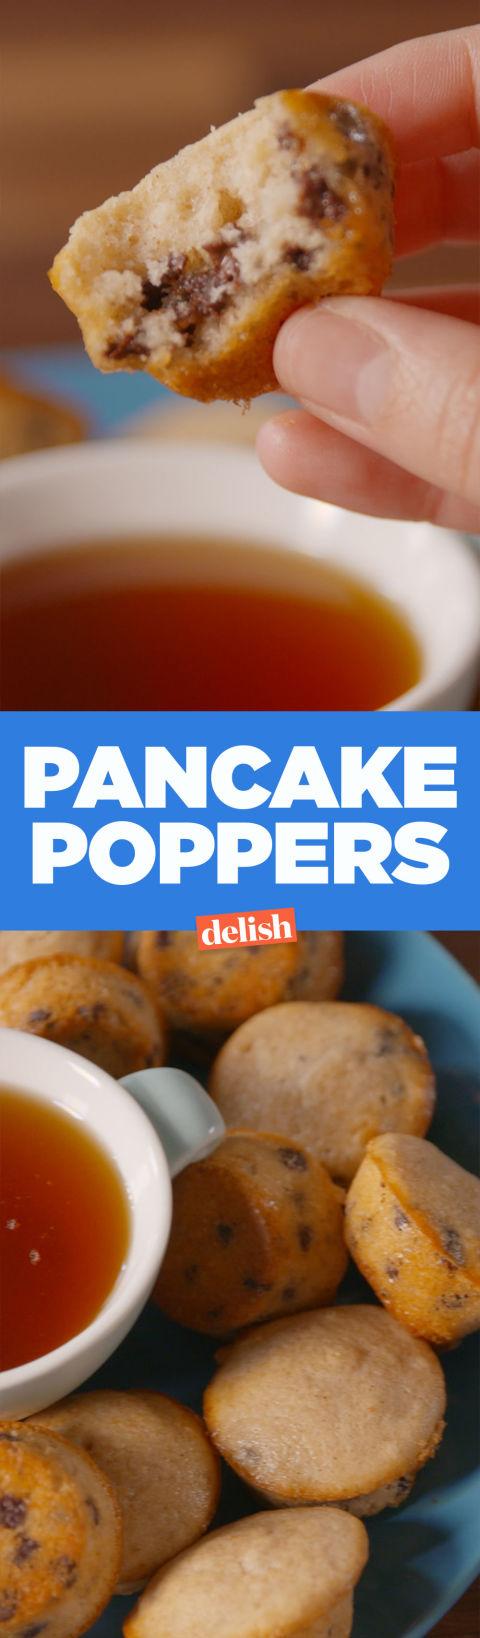 Baking Pancake Poppers Video Pancake Poppers Recipe How